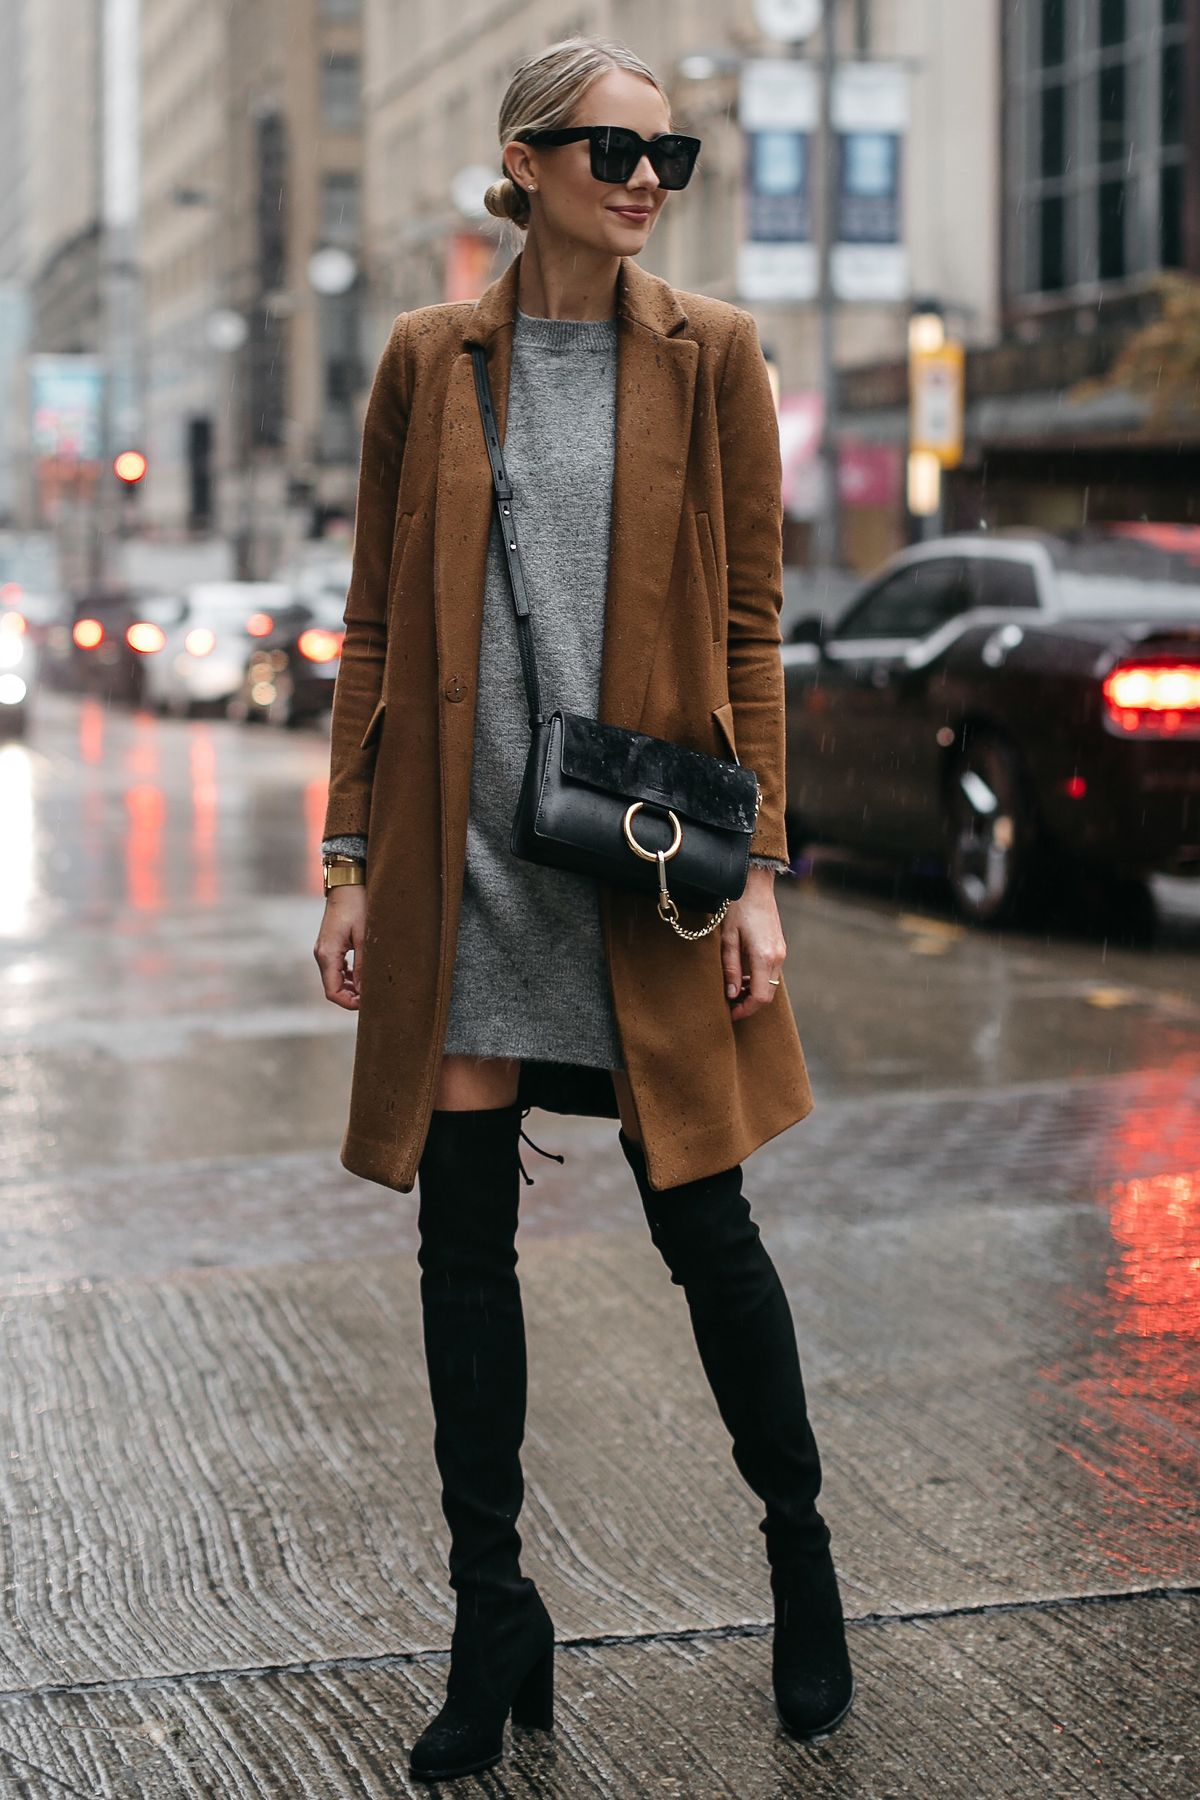 c200ea926b031 Blonde Woman Wearing Zara Camel Wool Coat Topshop Grey Sweater Dress Chloe  Faye Handbag Stuart Weitzman Black Over the Knee Boots Fashion Jackson  Dallas ...